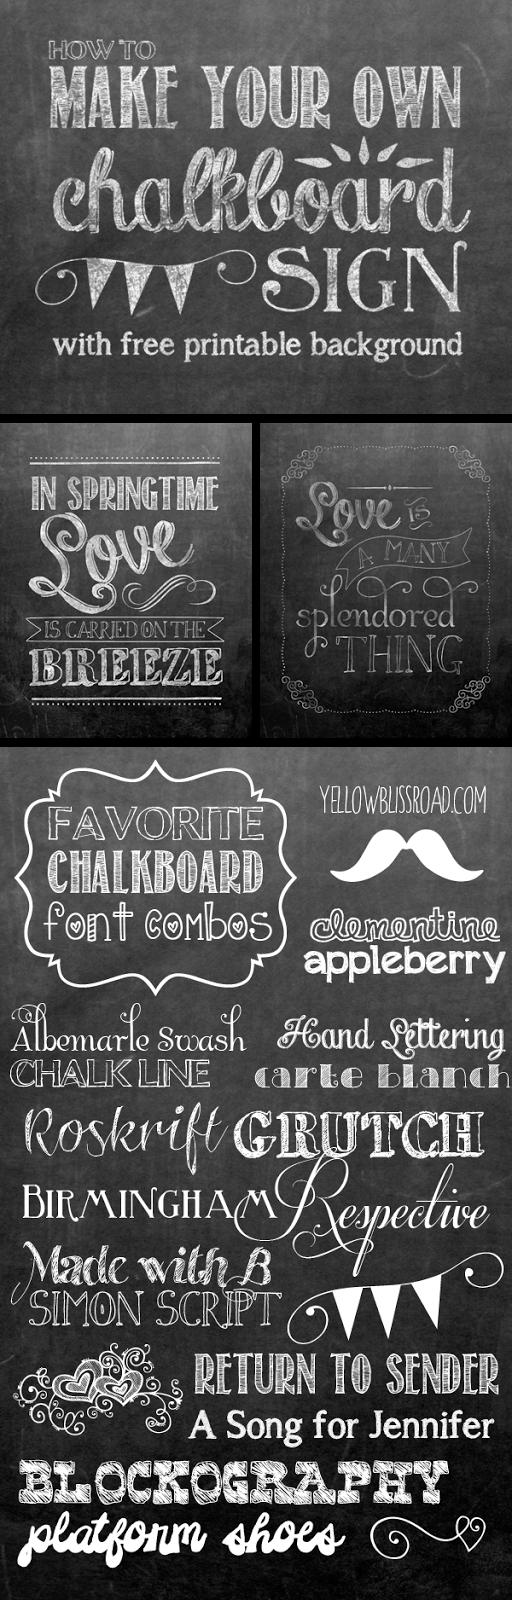 free downloadable chalkboard backgrounds